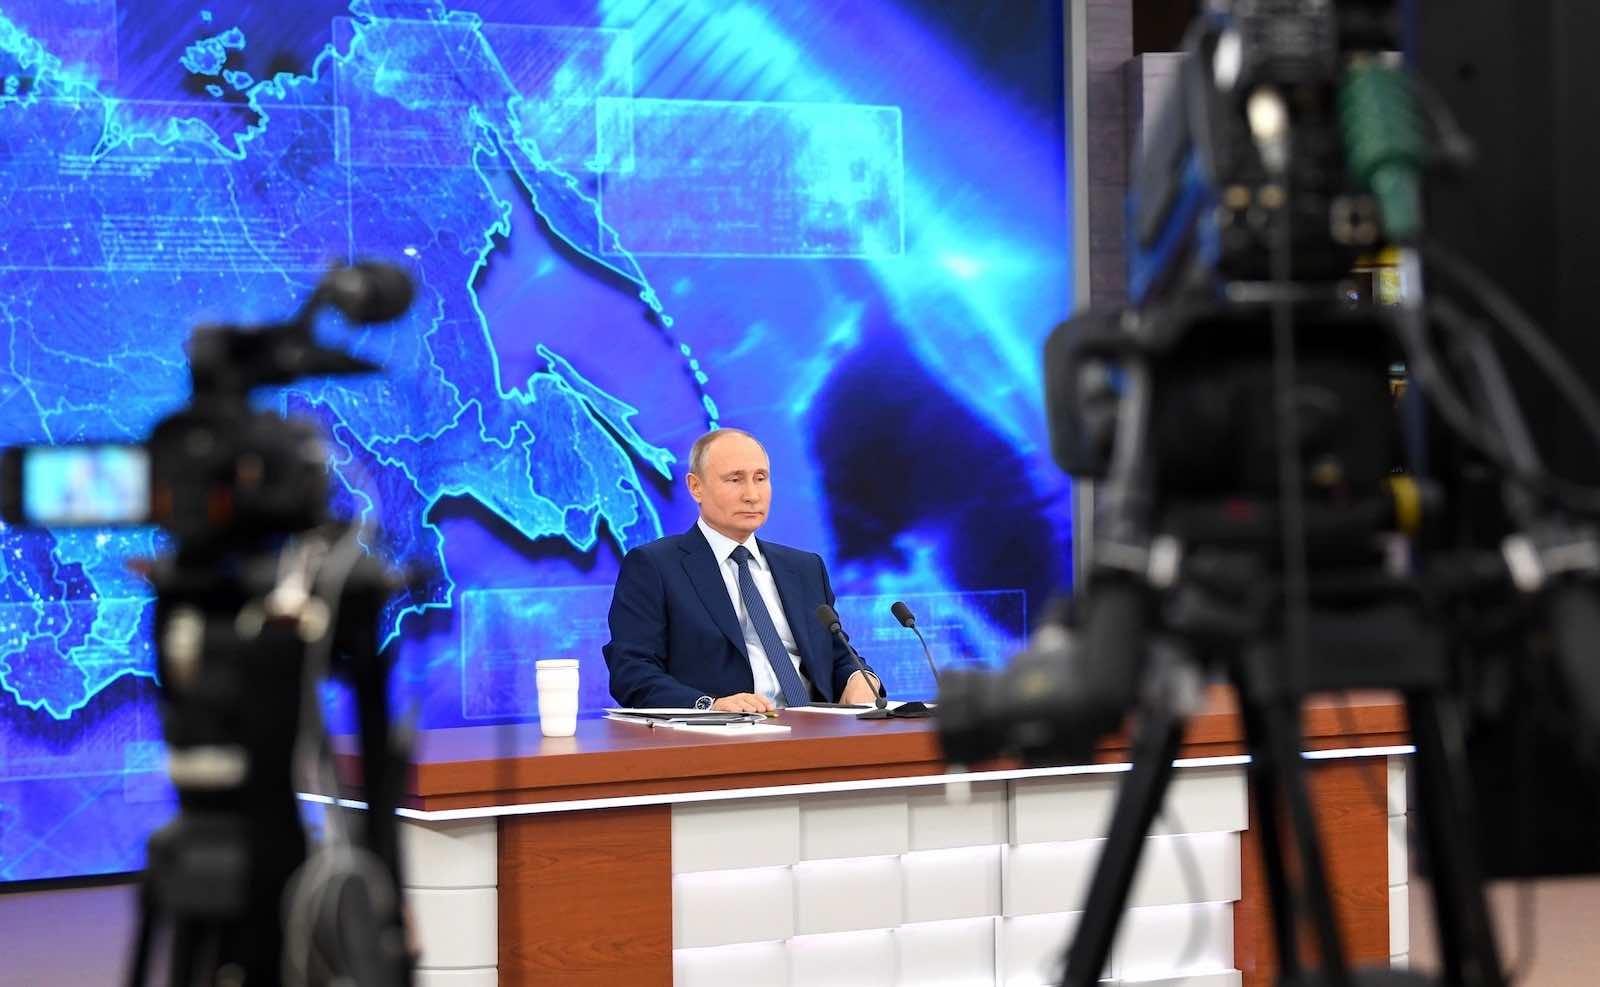 Russian President Vladimir Putin during his annual press conference in December 2020 (Kremlin.ru)